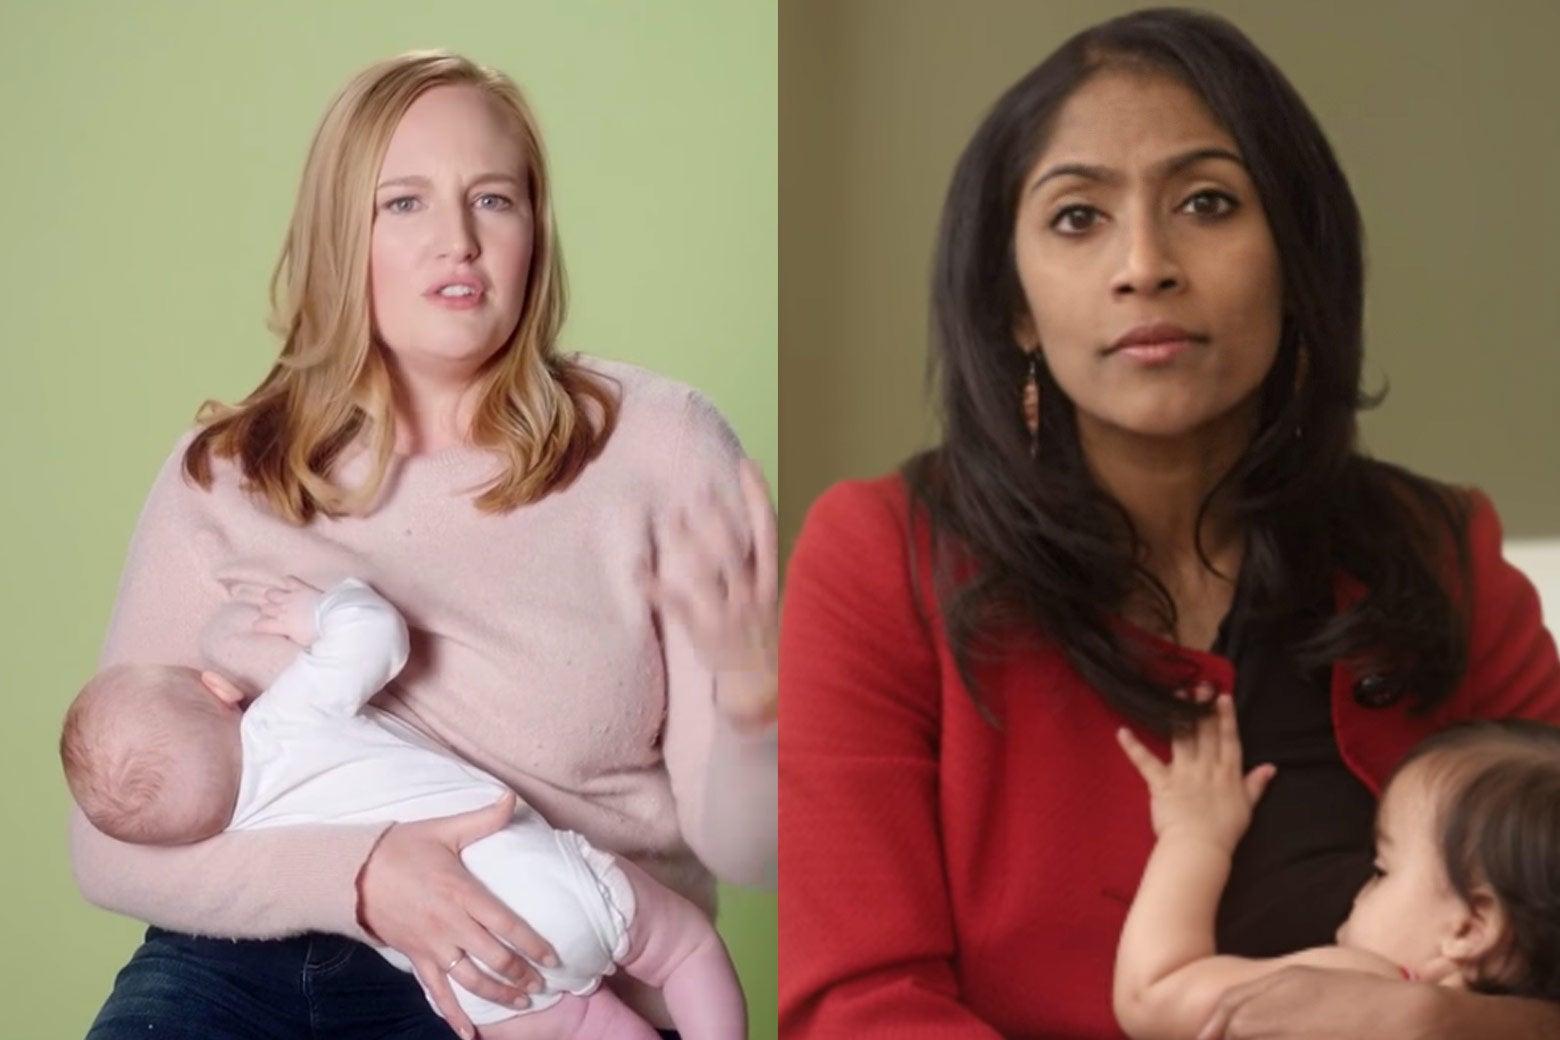 Splitscreen of Kelda Roys and Krish Vignarajah breastfeeding in their campaign ads.